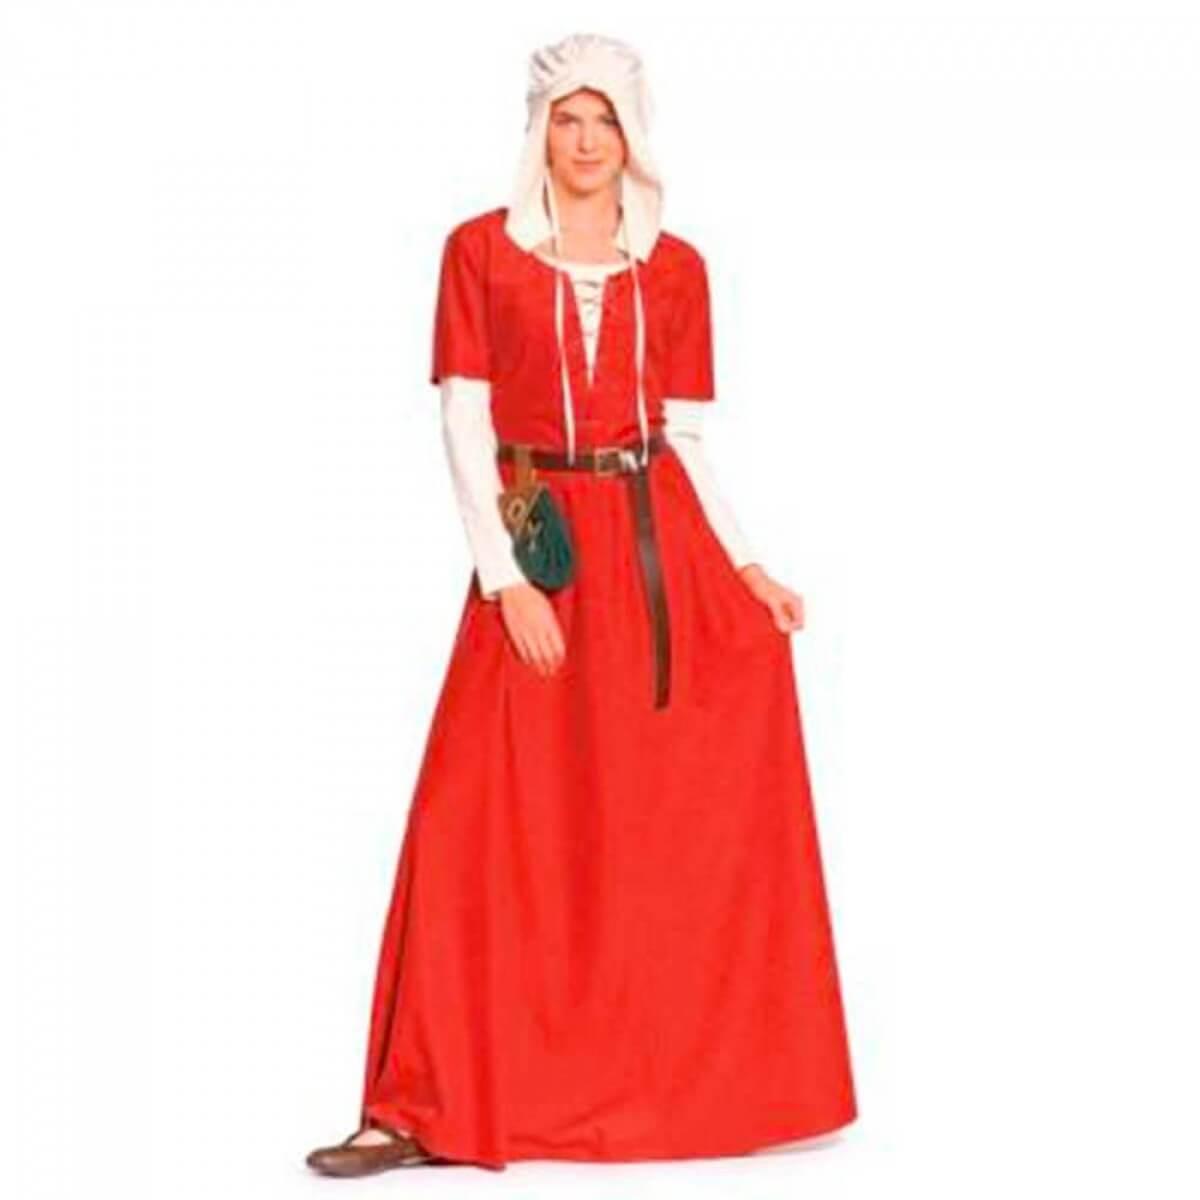 Burda Déguisement Robe Femme Moyen 7468 amp; Patron Coiffe Âge A67ZZx